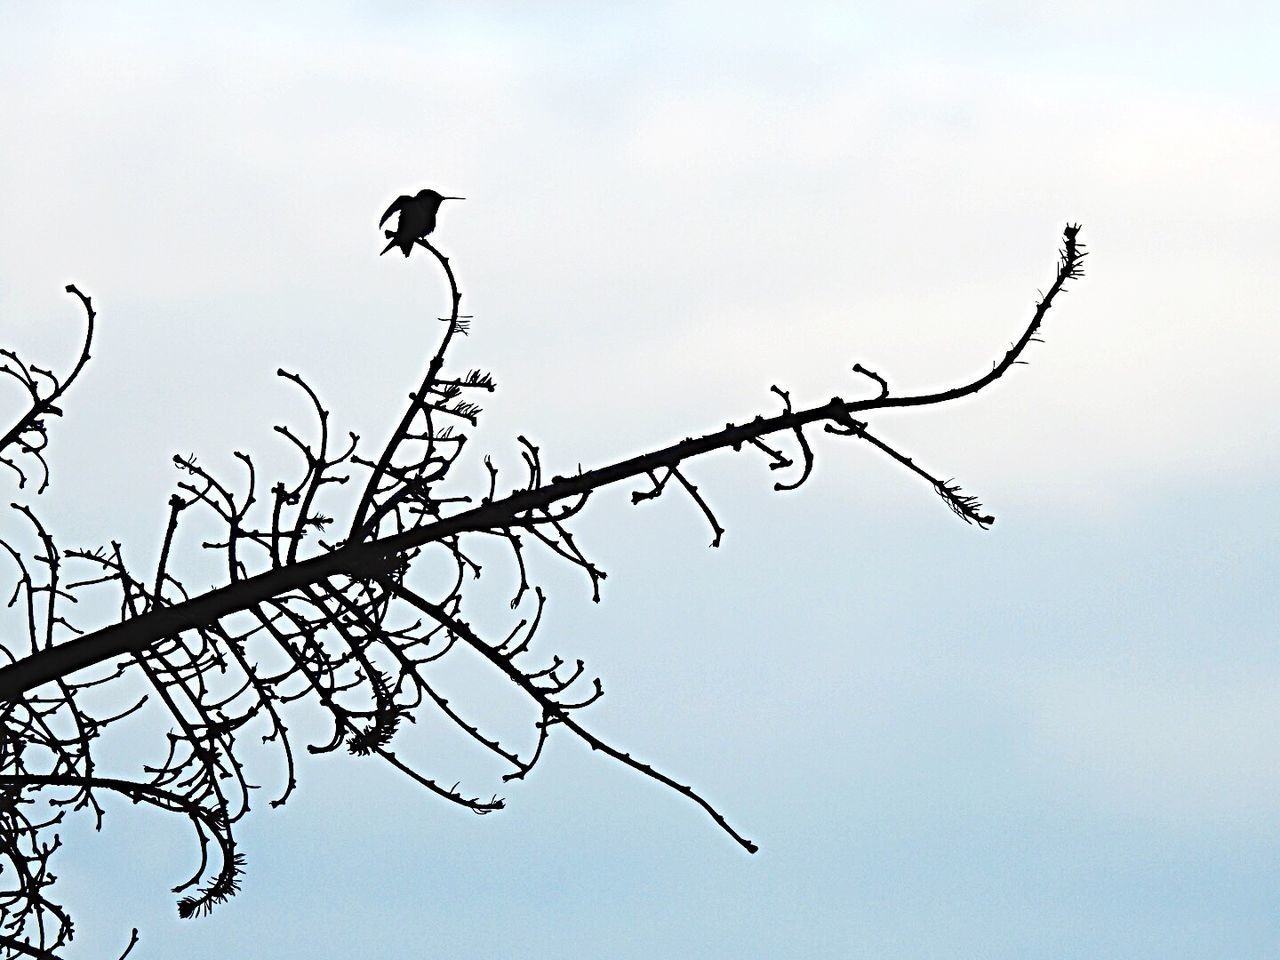 Bird No People Branch Perching Bare Tree Nature Outdoors Hummingbird Silhouette